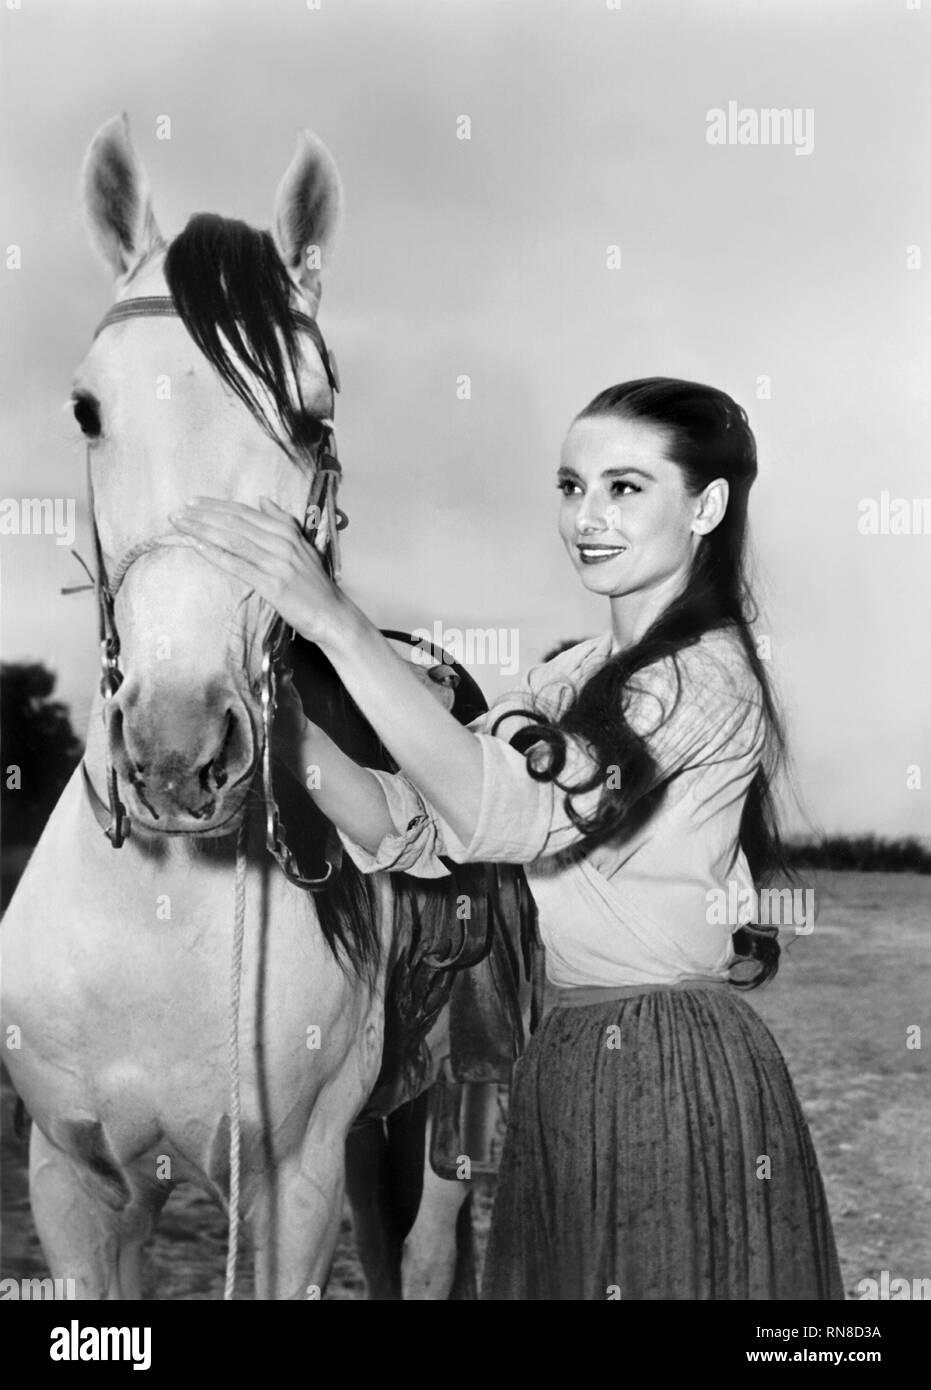 AUDREY HEPBURN,HORSE, THE UNFORGIVEN, 1960 - Stock Image